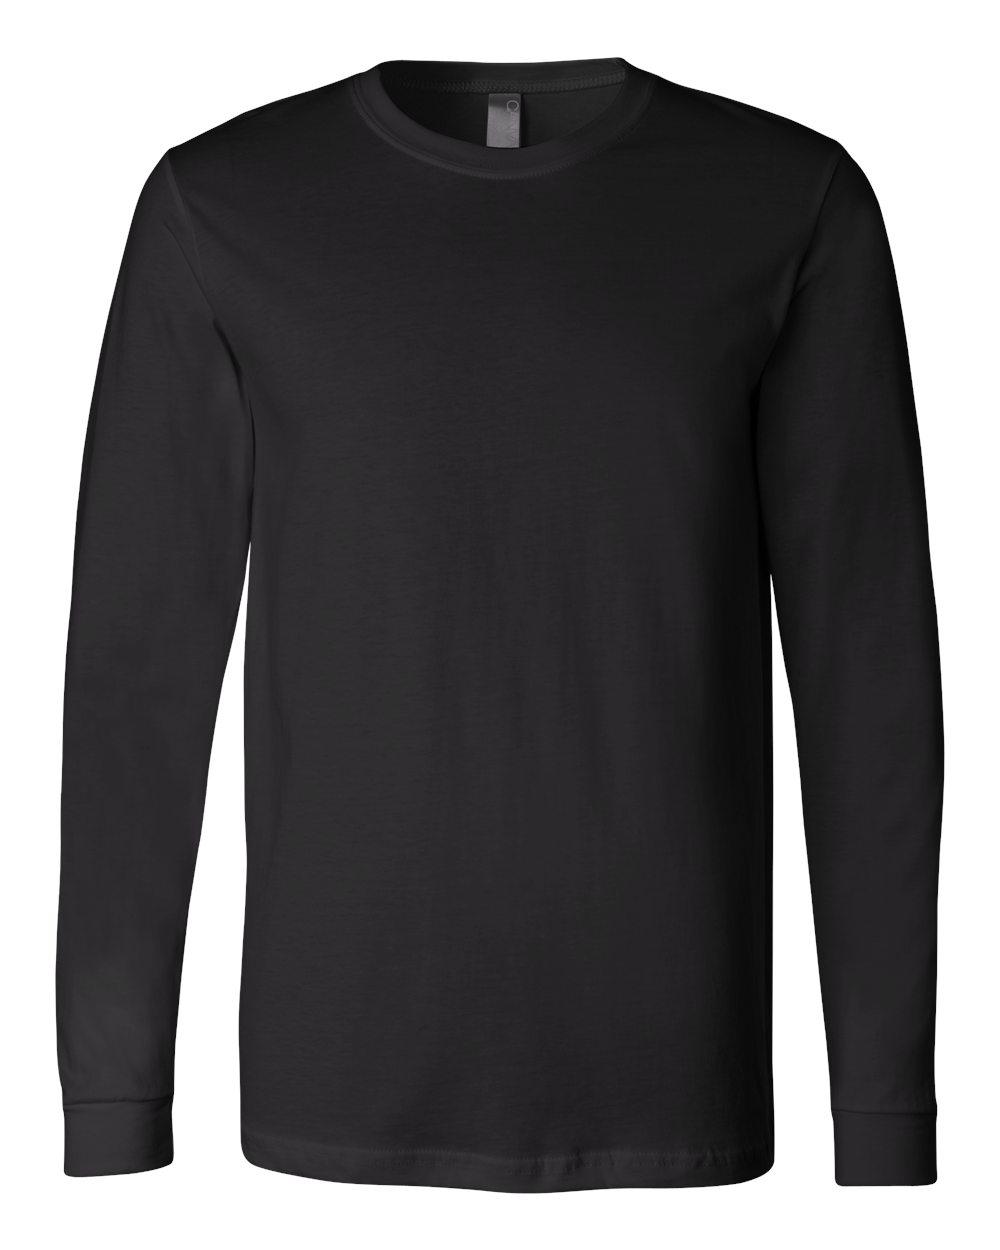 Bella-Canvas-Mens-Blank-Top-Long-Sleeve-Jersey-Tee-T-Shirt-3501-up-to-3XL thumbnail 18